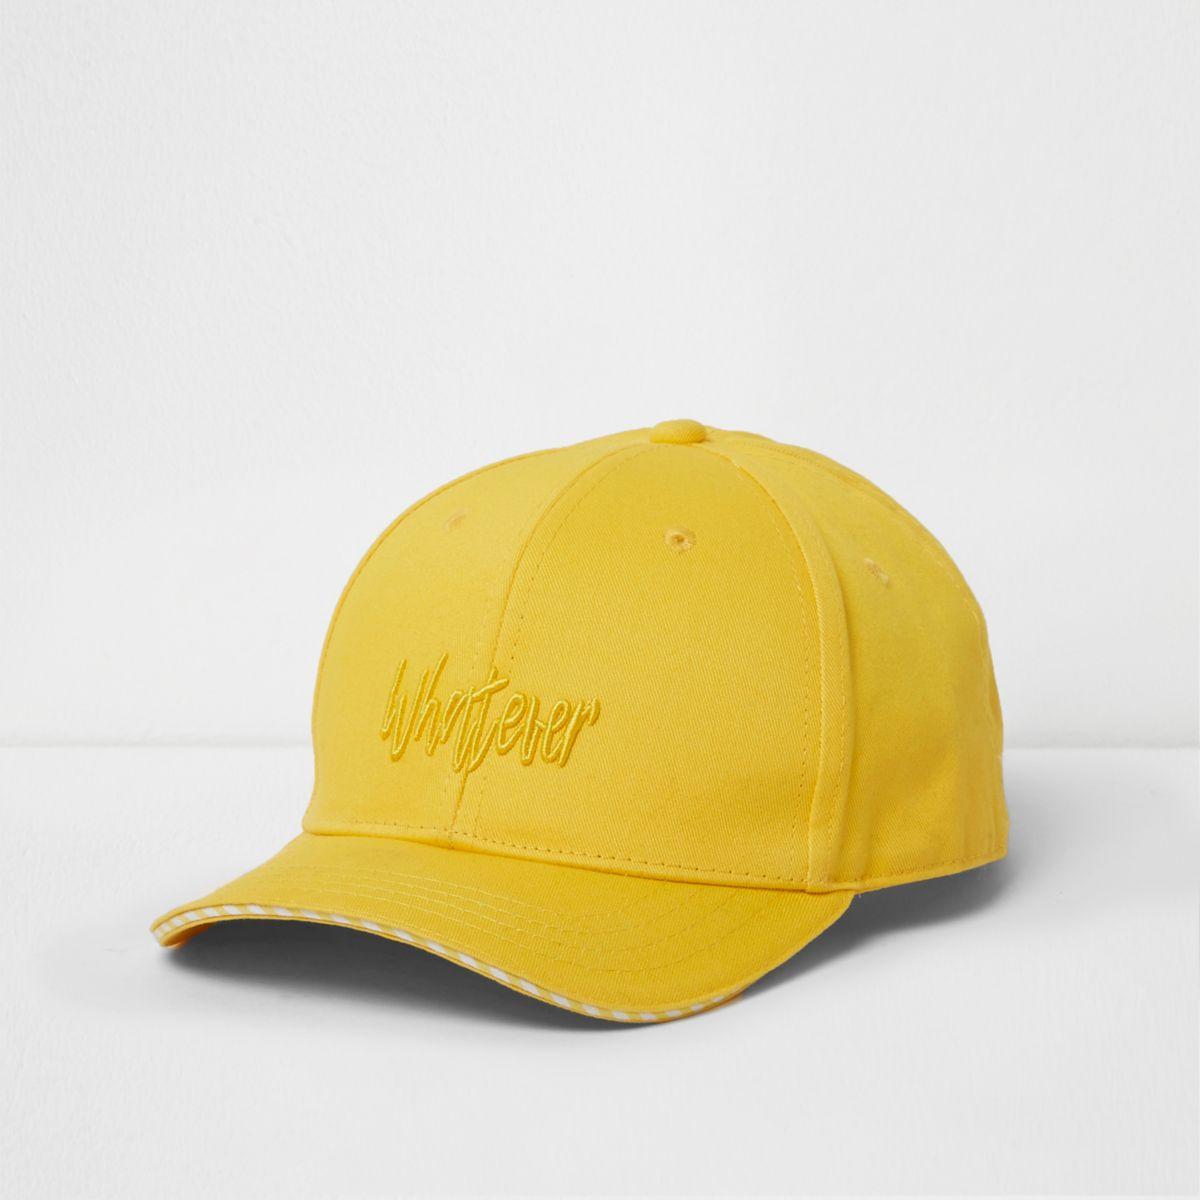 Boys yellow 'whatever' baseball cap